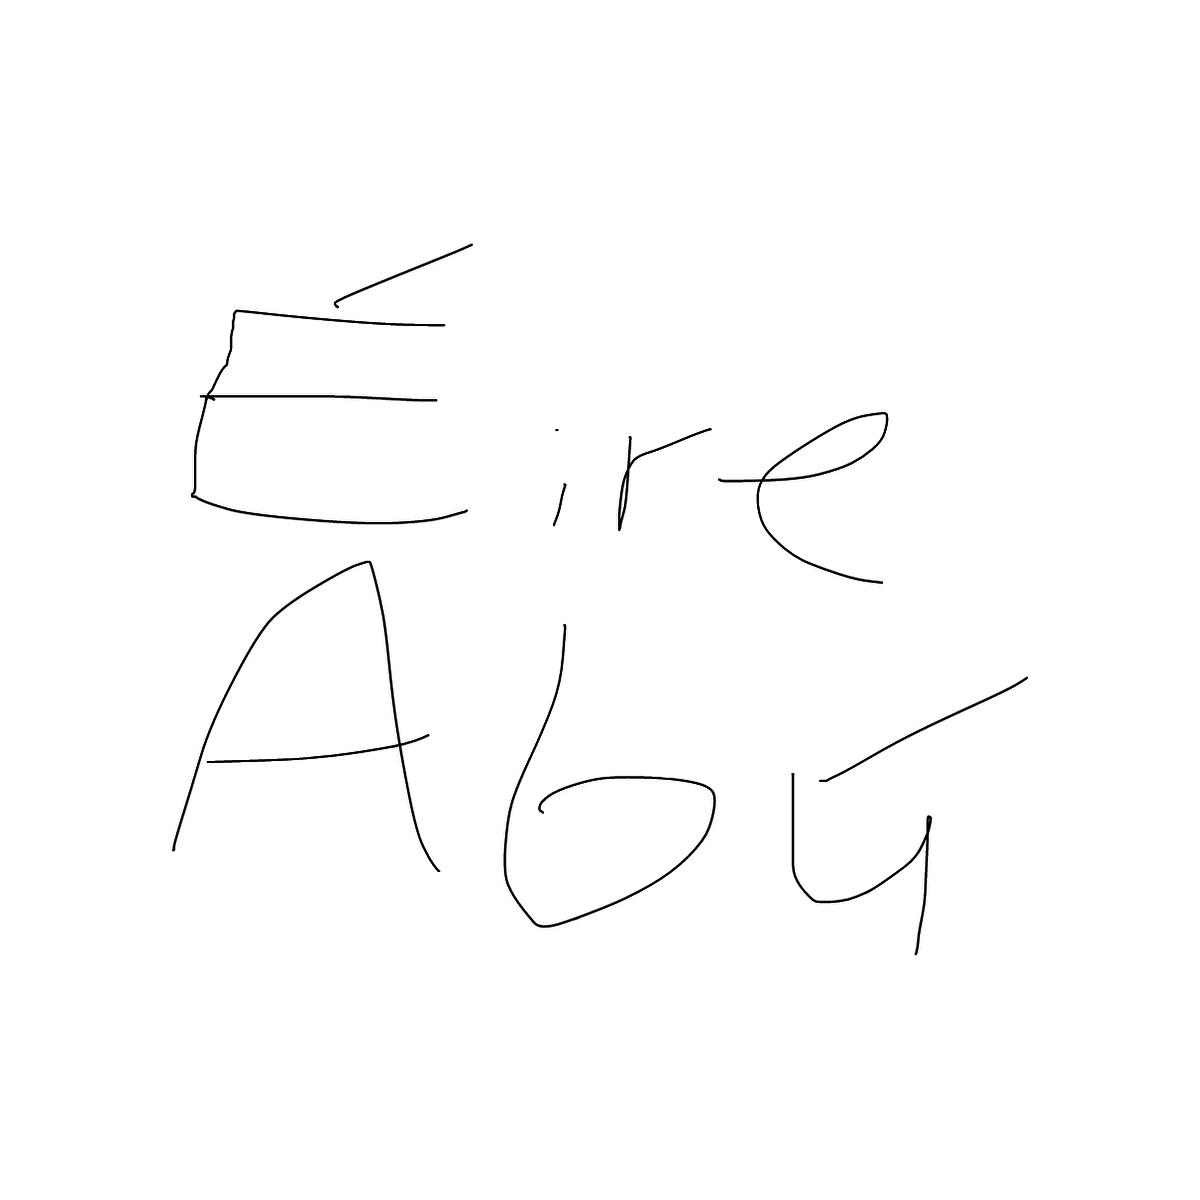 BAAAM drawing#5389 lat:54.5477218627929700lng: -5.8976950645446780